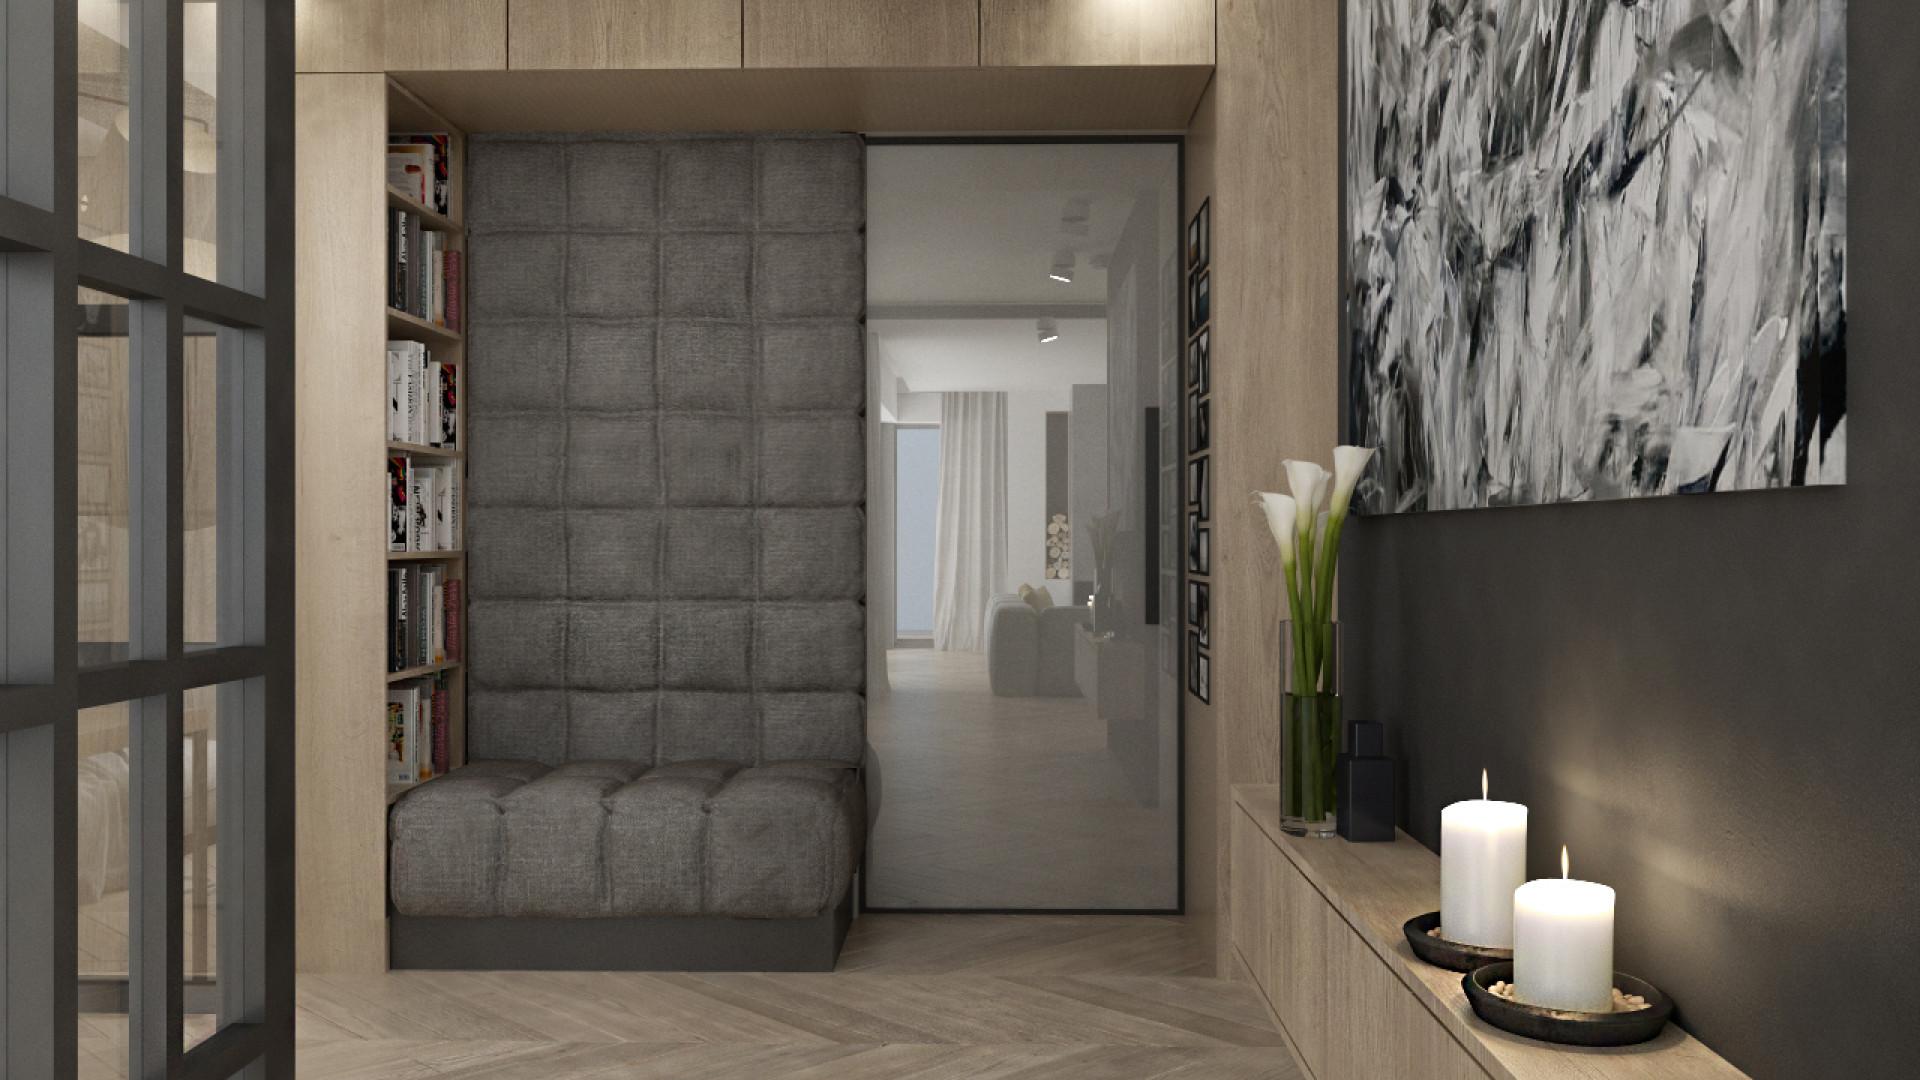 Wnętrze Corner House (korytarz). Projekt: 3DProjekt. Fot. 3DProjekt